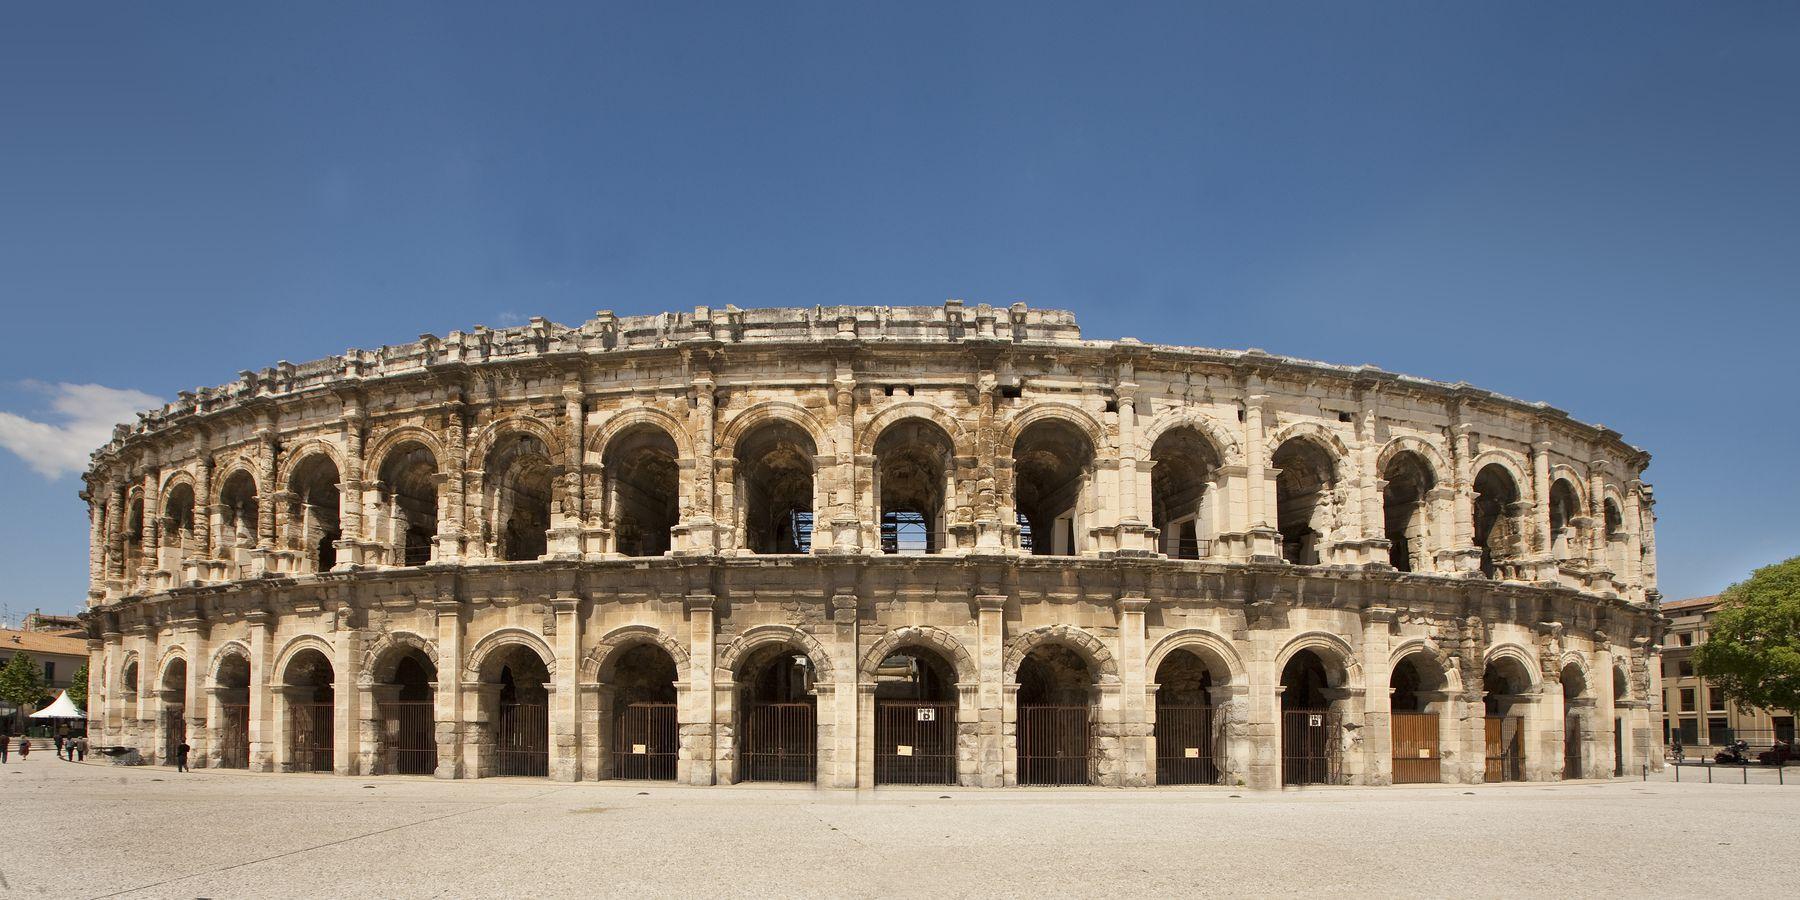 Arenes_de_Nimes._Photo_Office_de_Tourisme_O.Maynard - Doets Reizen Frankrijk - Credit photos OT Nîmes